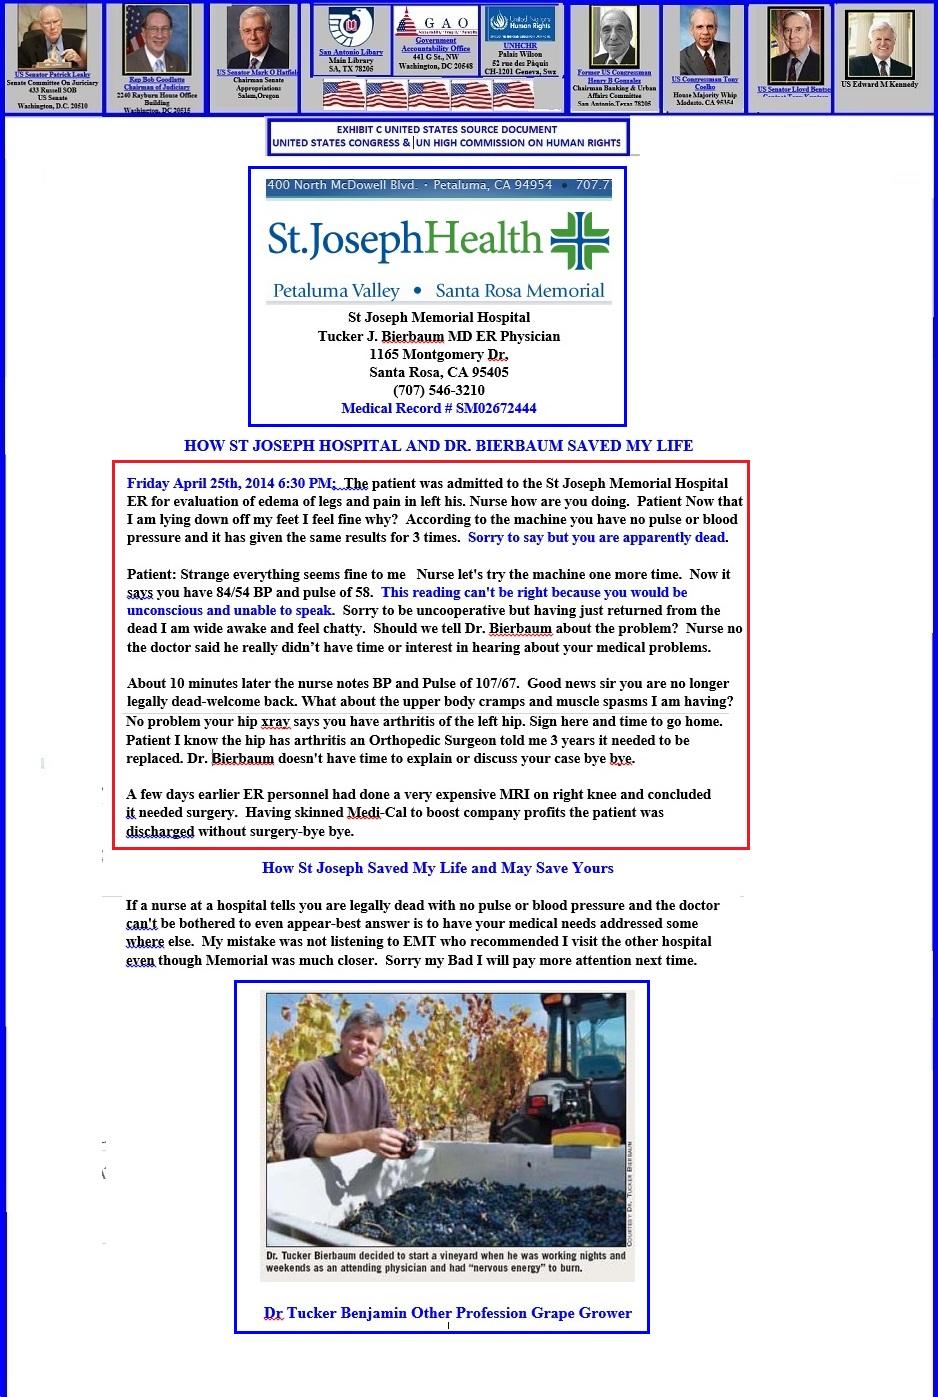 Apply Medical Fresno Ca